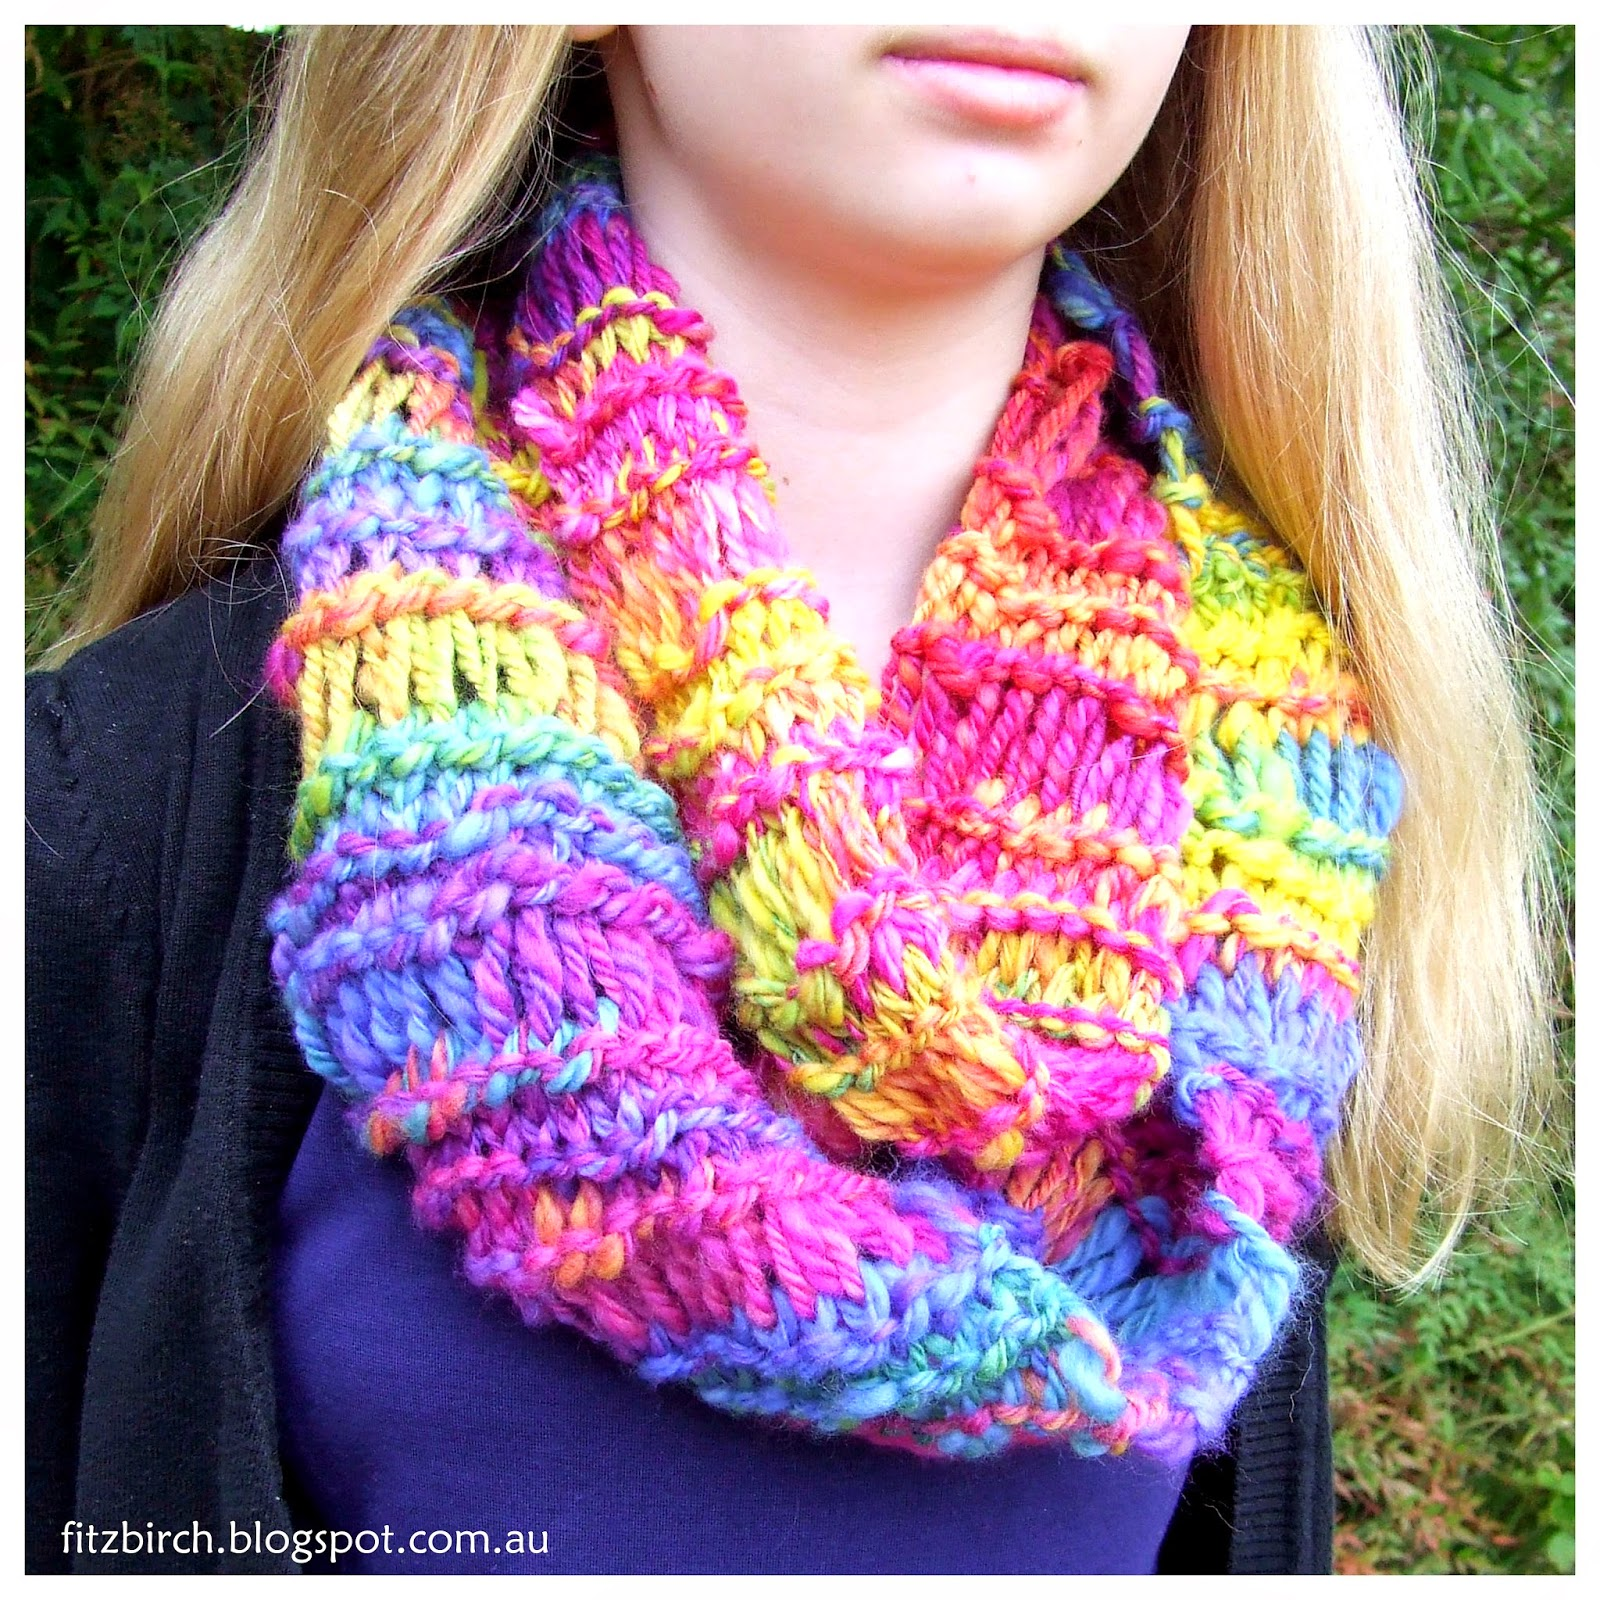 Crochet Scarf Patterns With Homespun Yarn : FitzBirch Crafts: Homespun Cowl